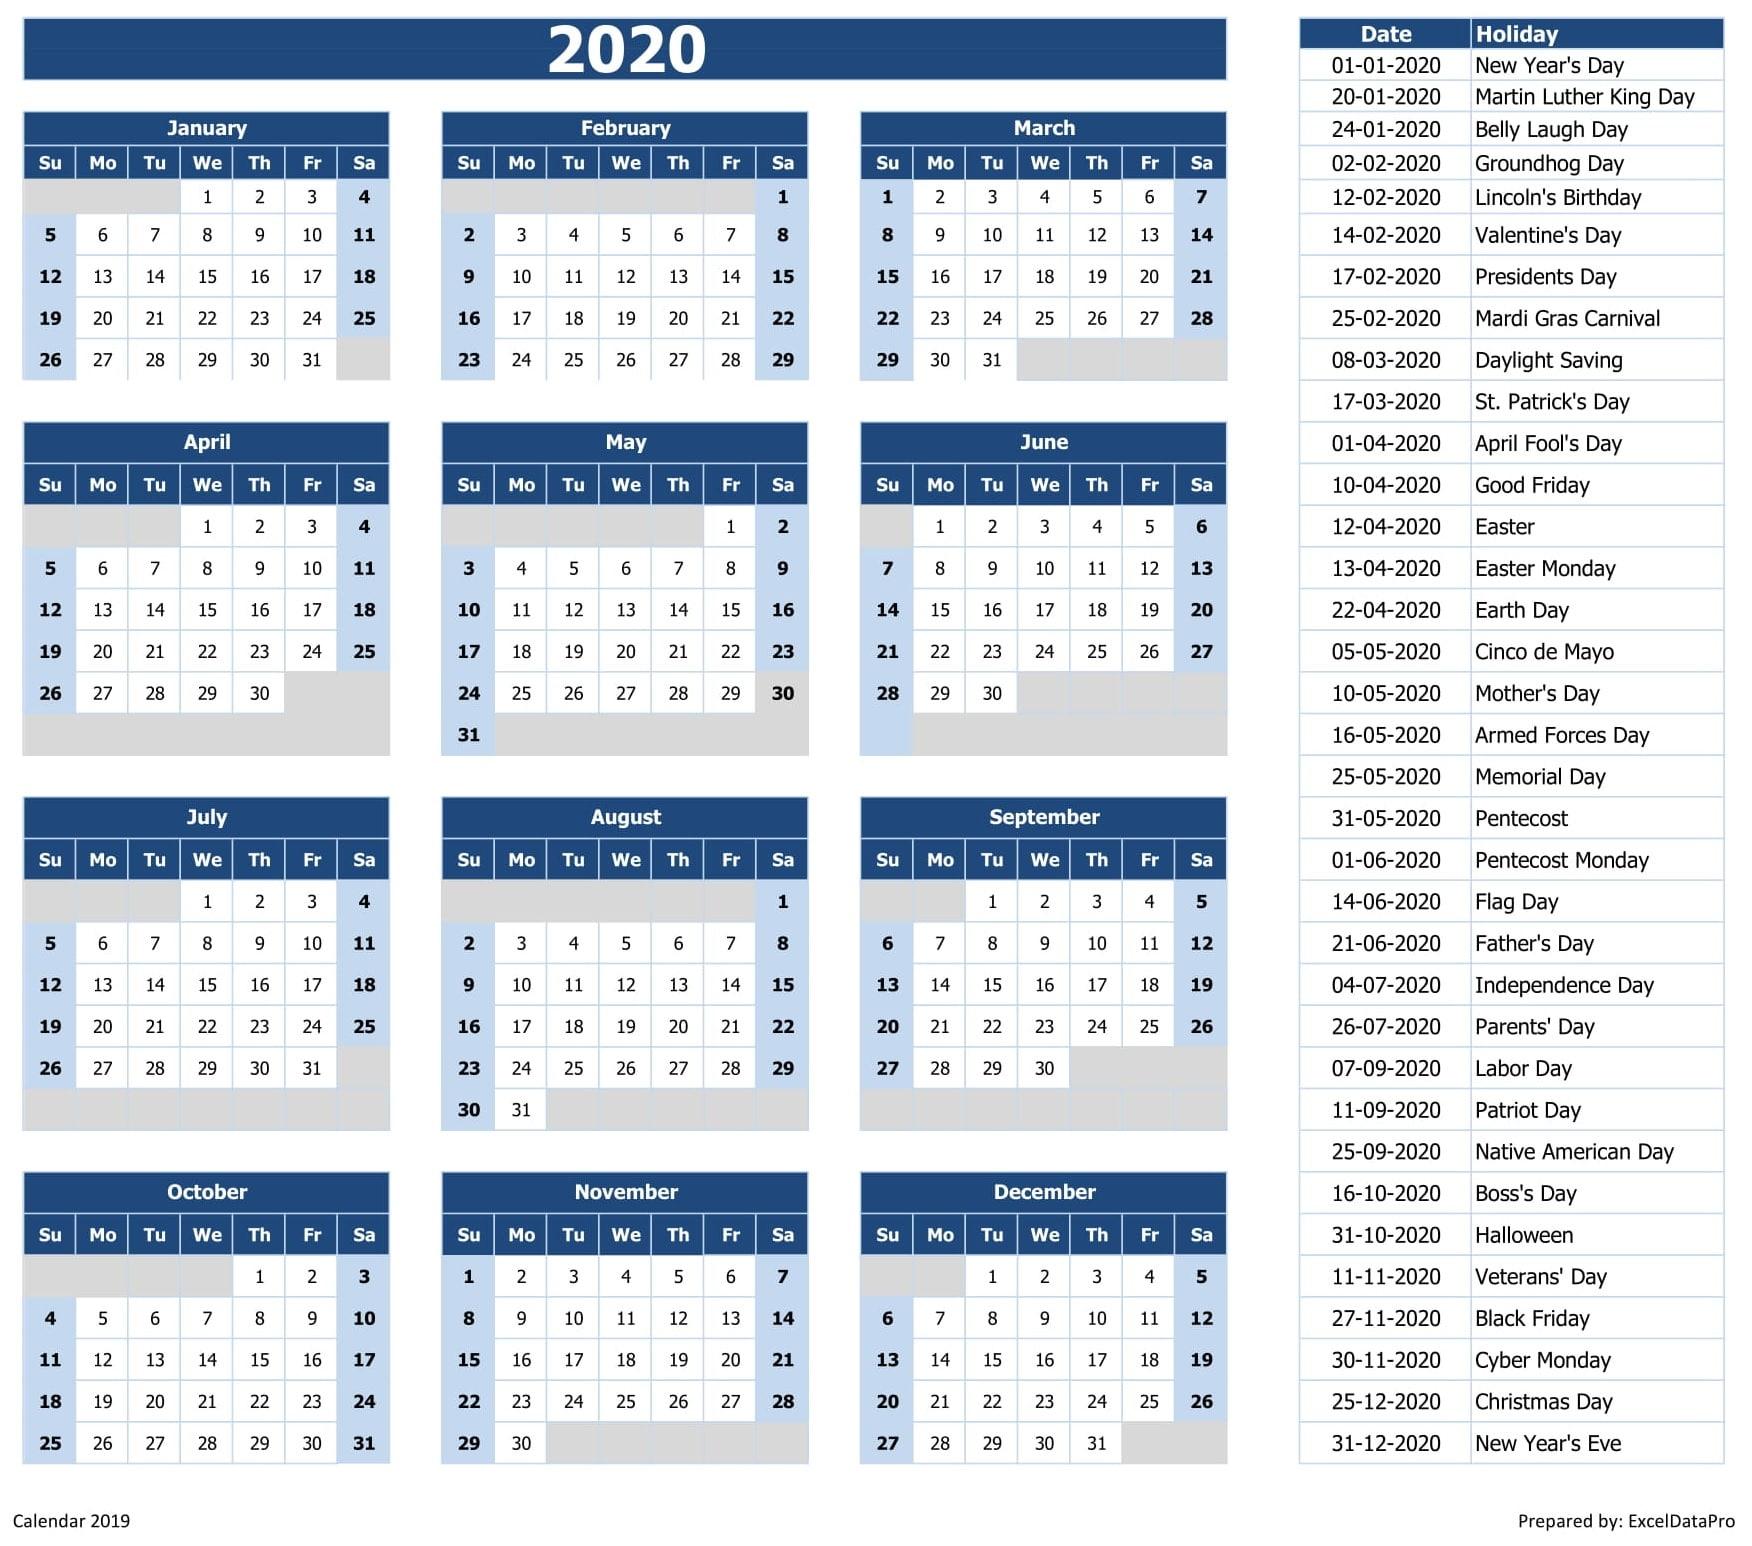 2020 Calendar Template Excel: Download 2020 Yearly Calendar (Sun Start) Excel Template